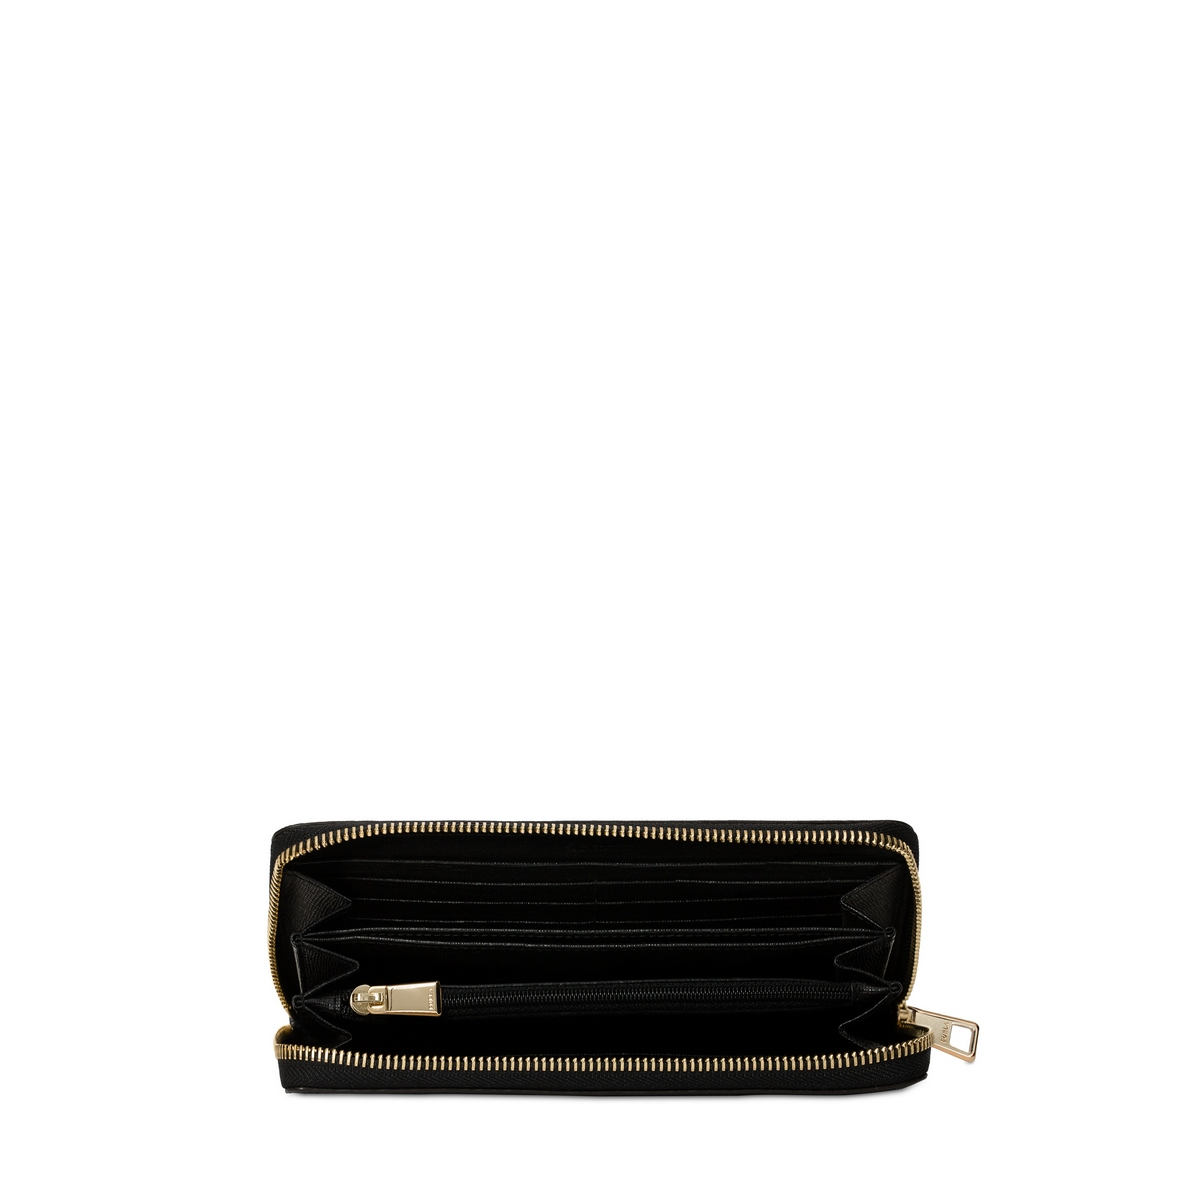 high quality on feet images of reasonably priced Furla portafogli da donna in pelle Babylon XL nero